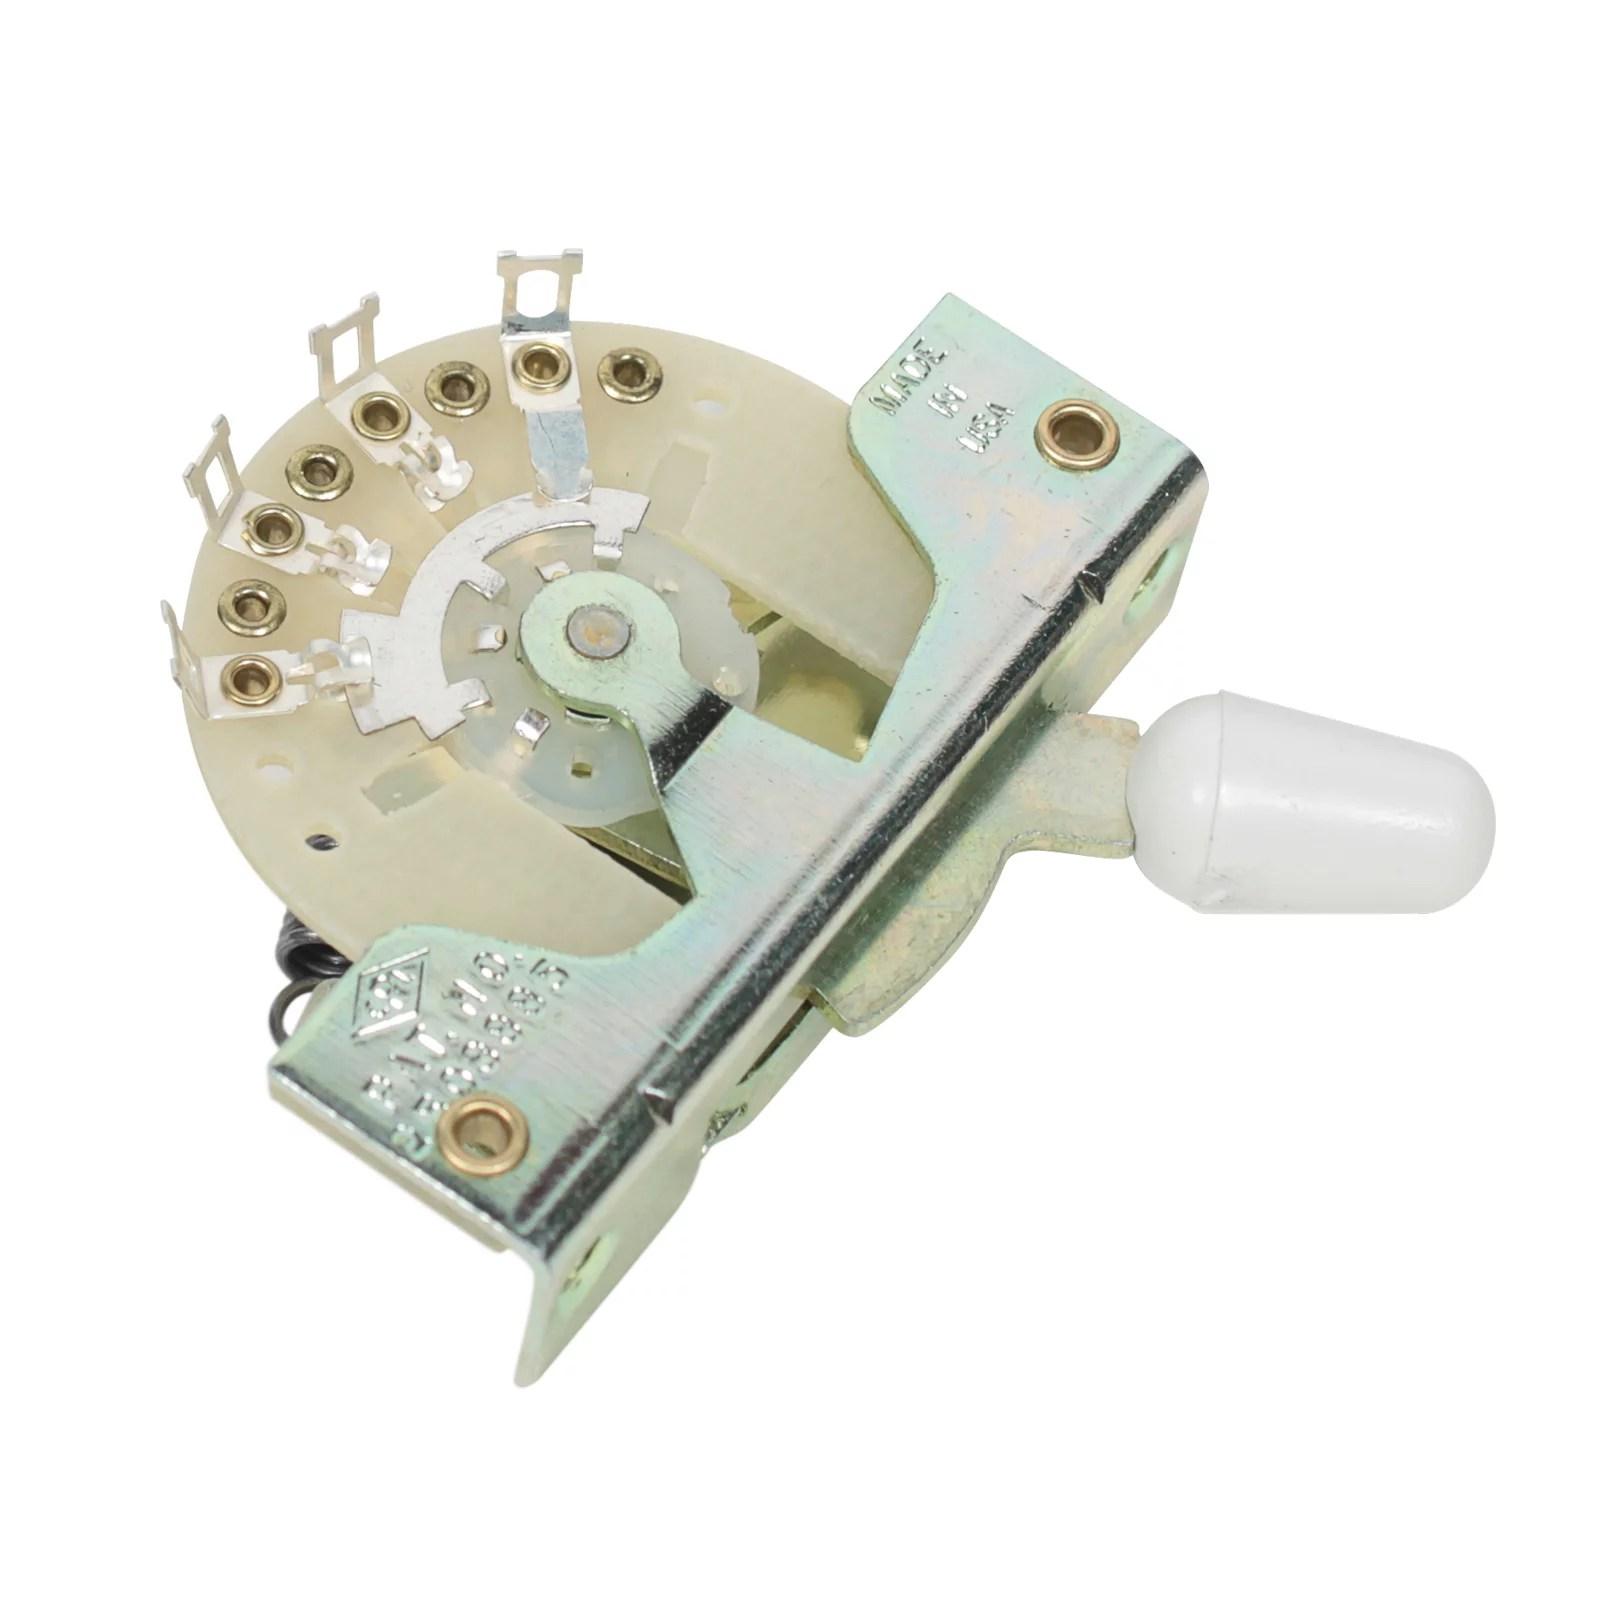 medium resolution of fender stratocaster guitar 5 way wiring kit crl switch cts pots fender stratocaster guitar 5way wiring kit crl switch cts pots